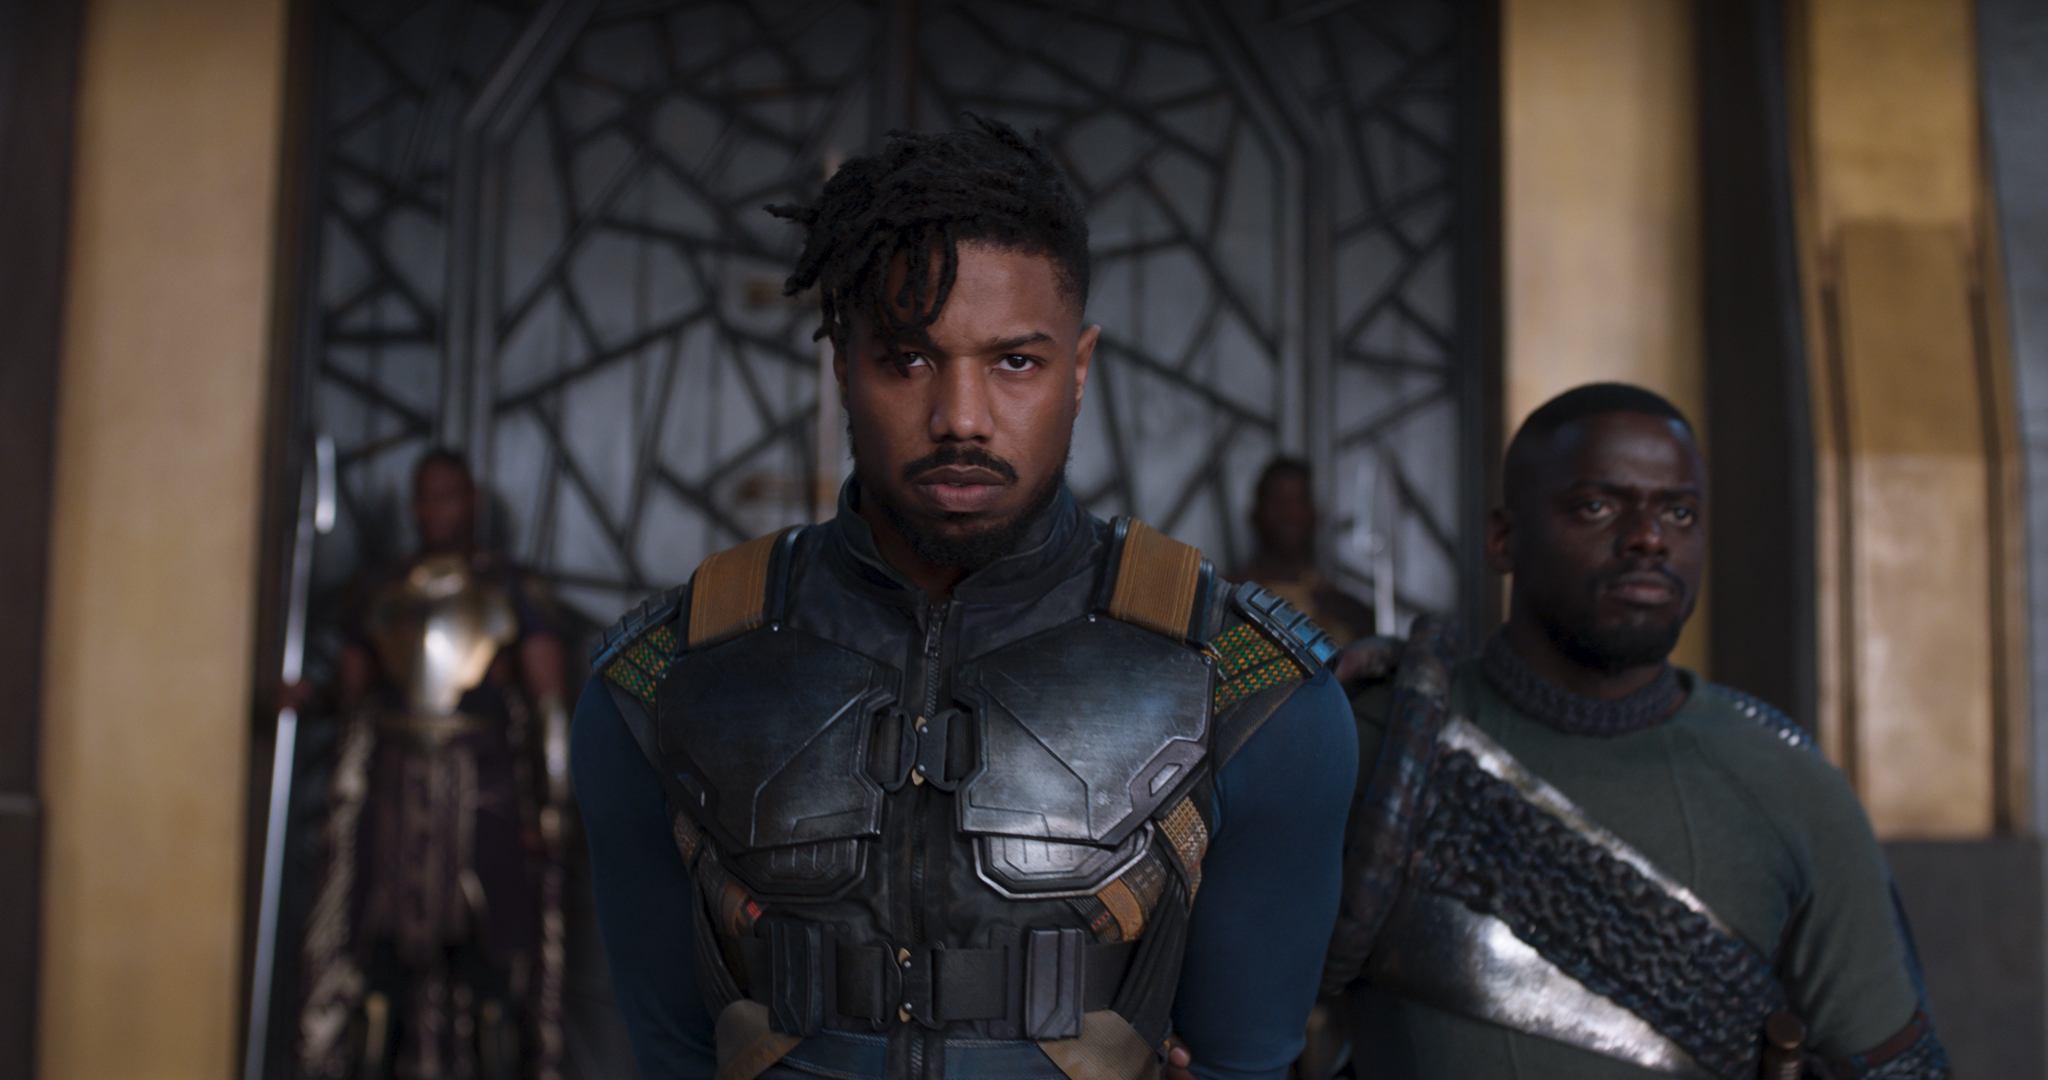 Michael B. Jordan's Killmonger wears an armored vest in Black Panther